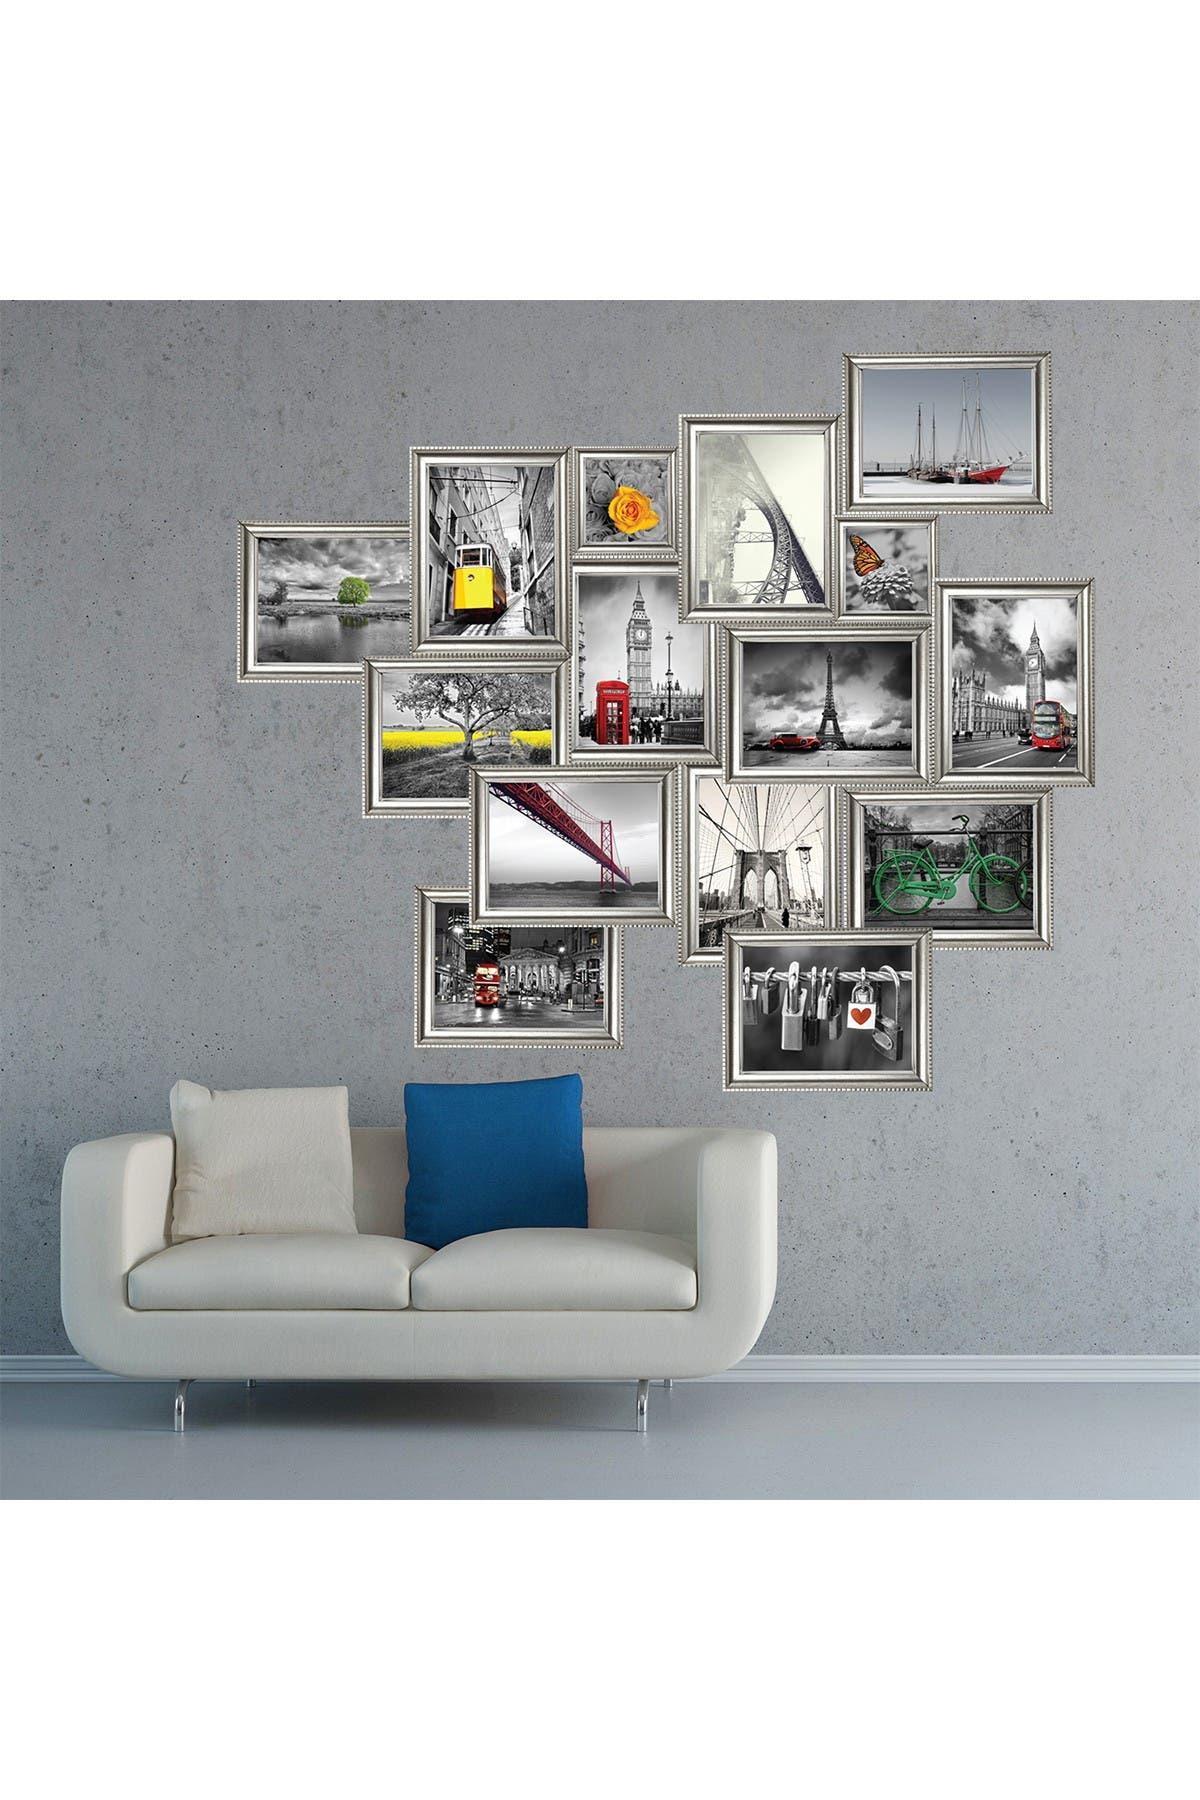 Image of WalPlus 3D Landscape Silver Frames Decal